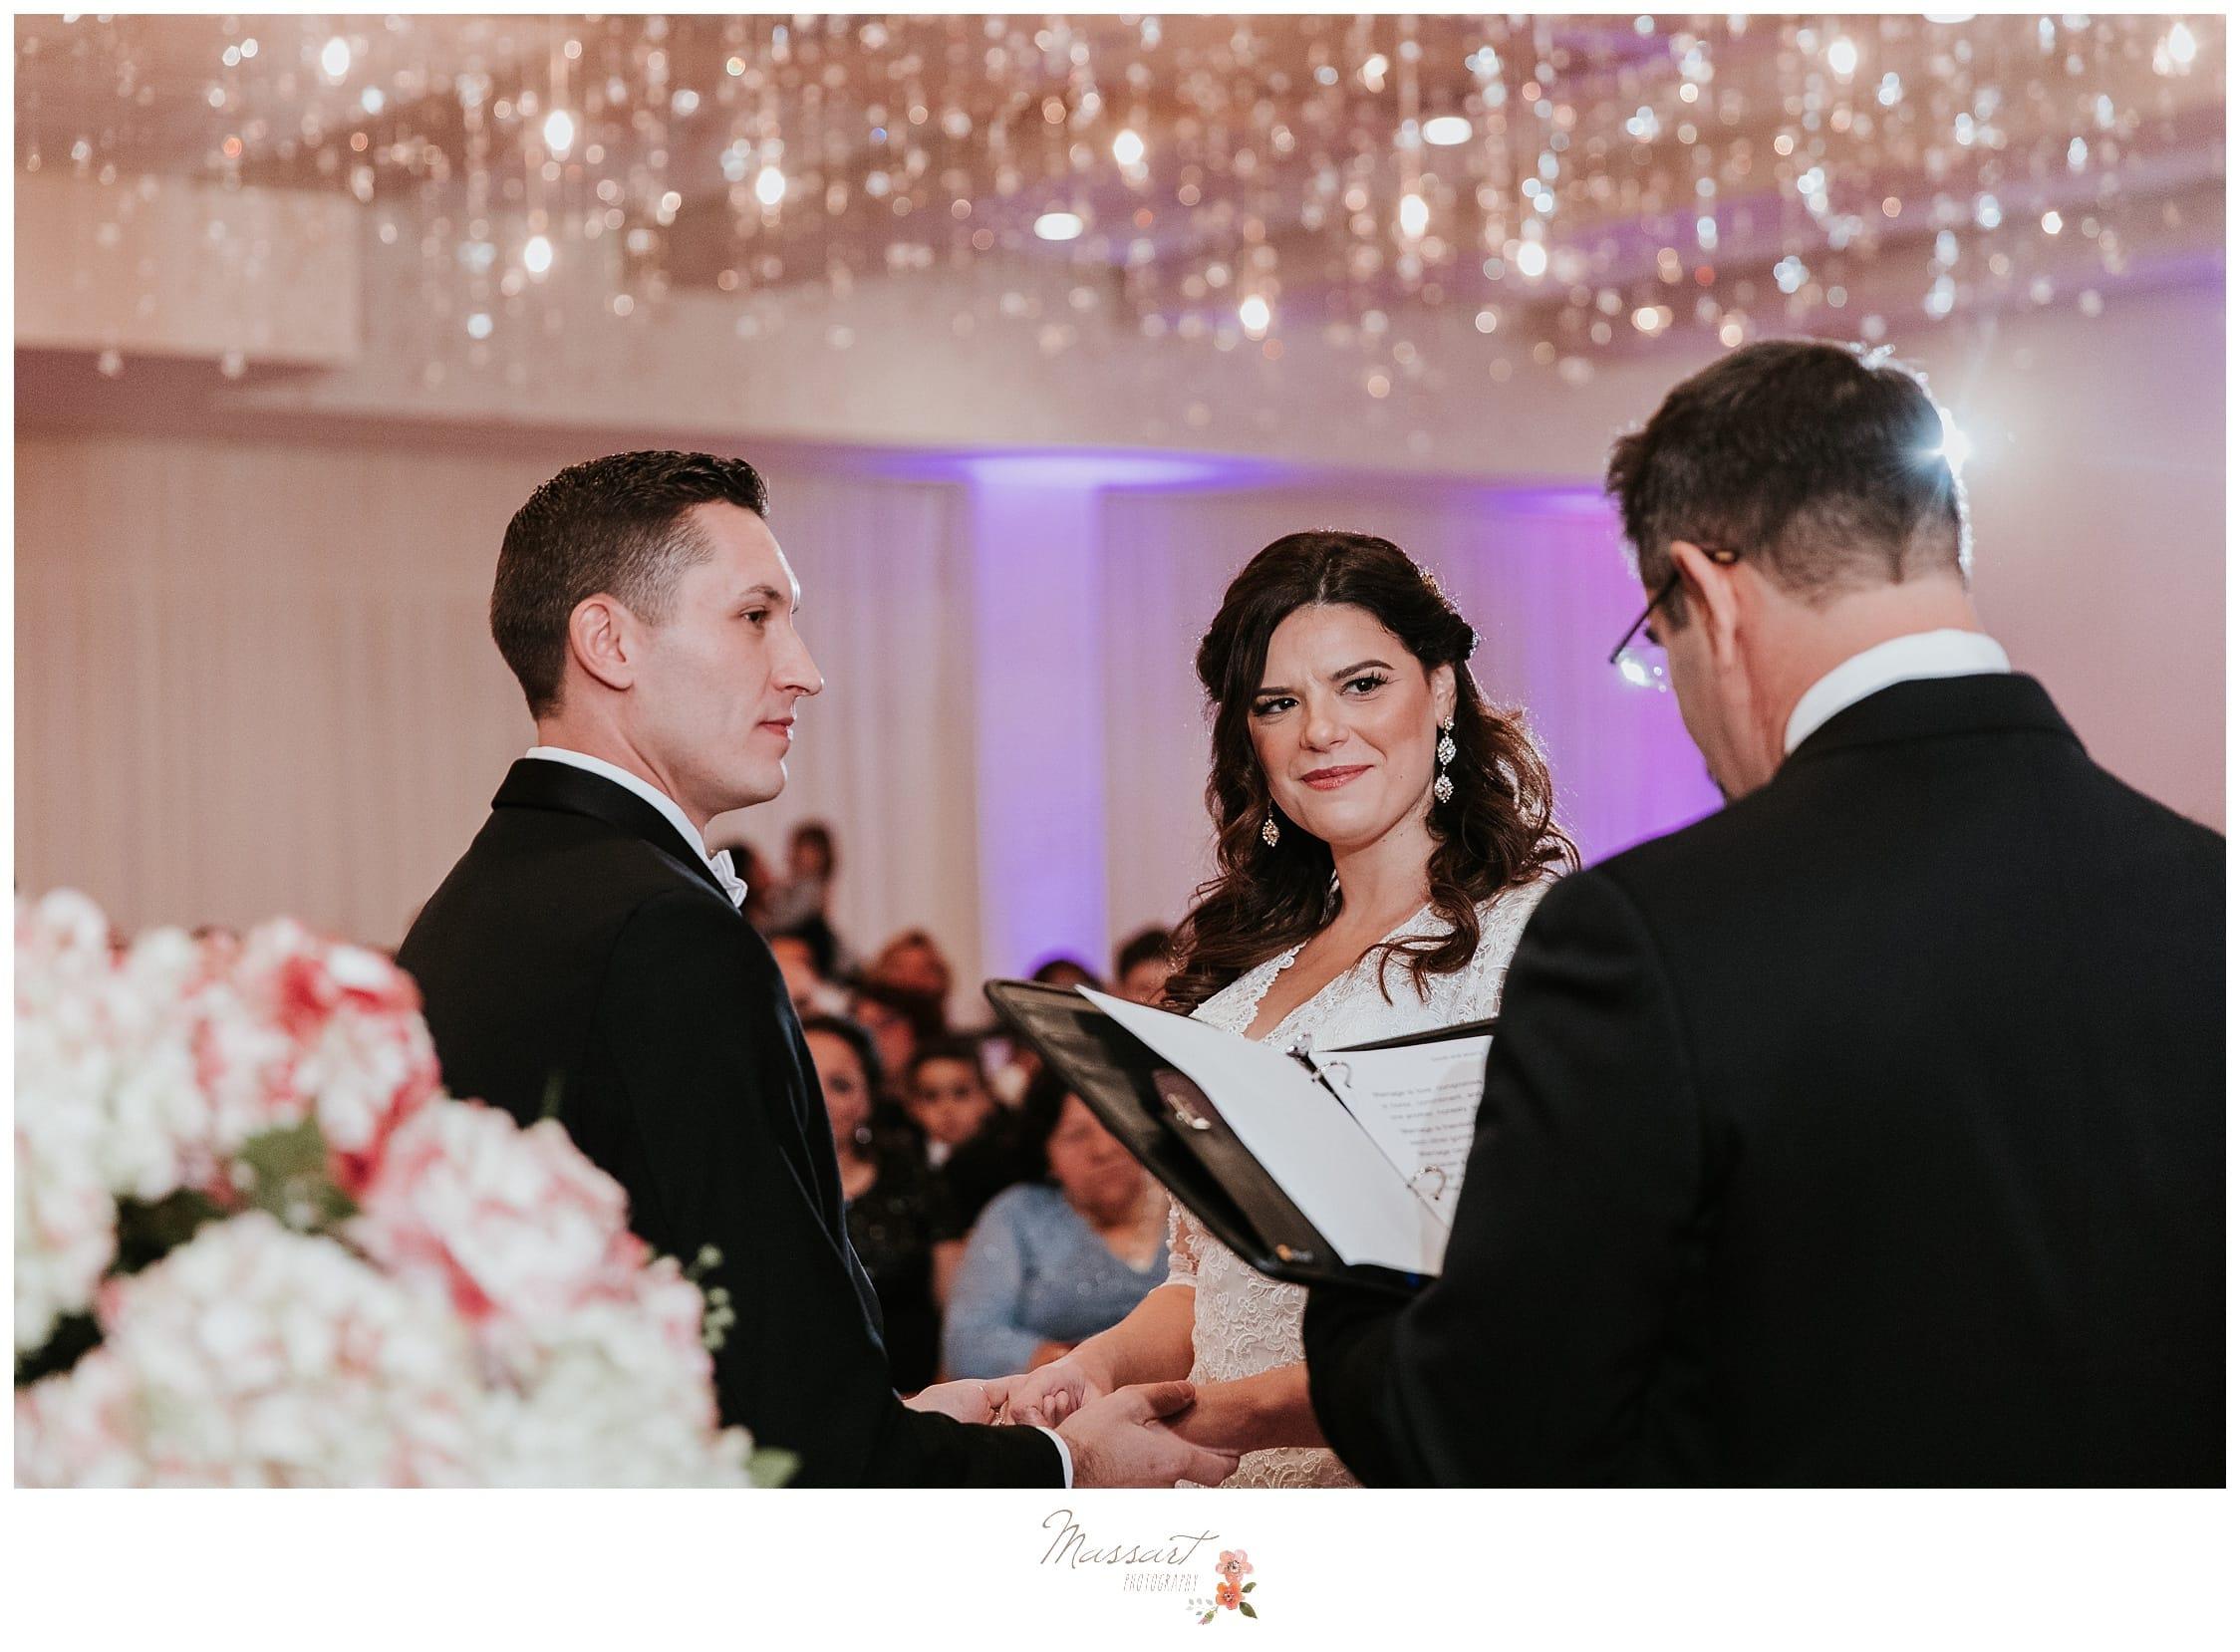 Massart photographers from warwick, RI photograph a wedding ceremony in the ballroom at the atlantic resort in newport